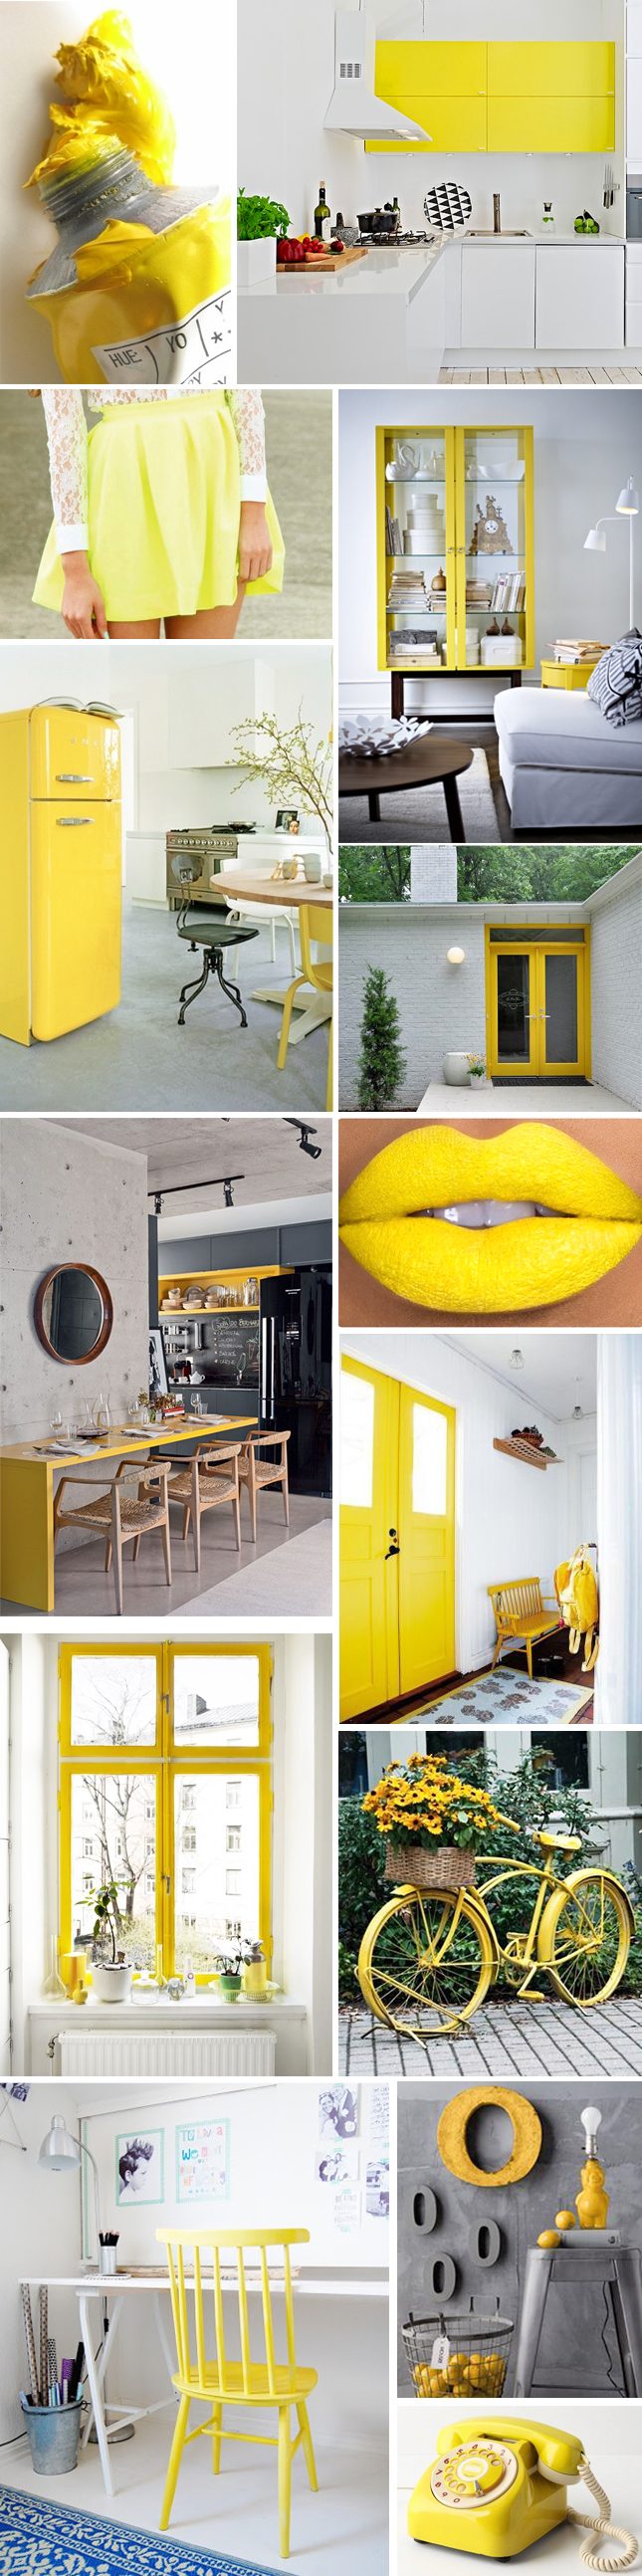 decnet-yellow-01